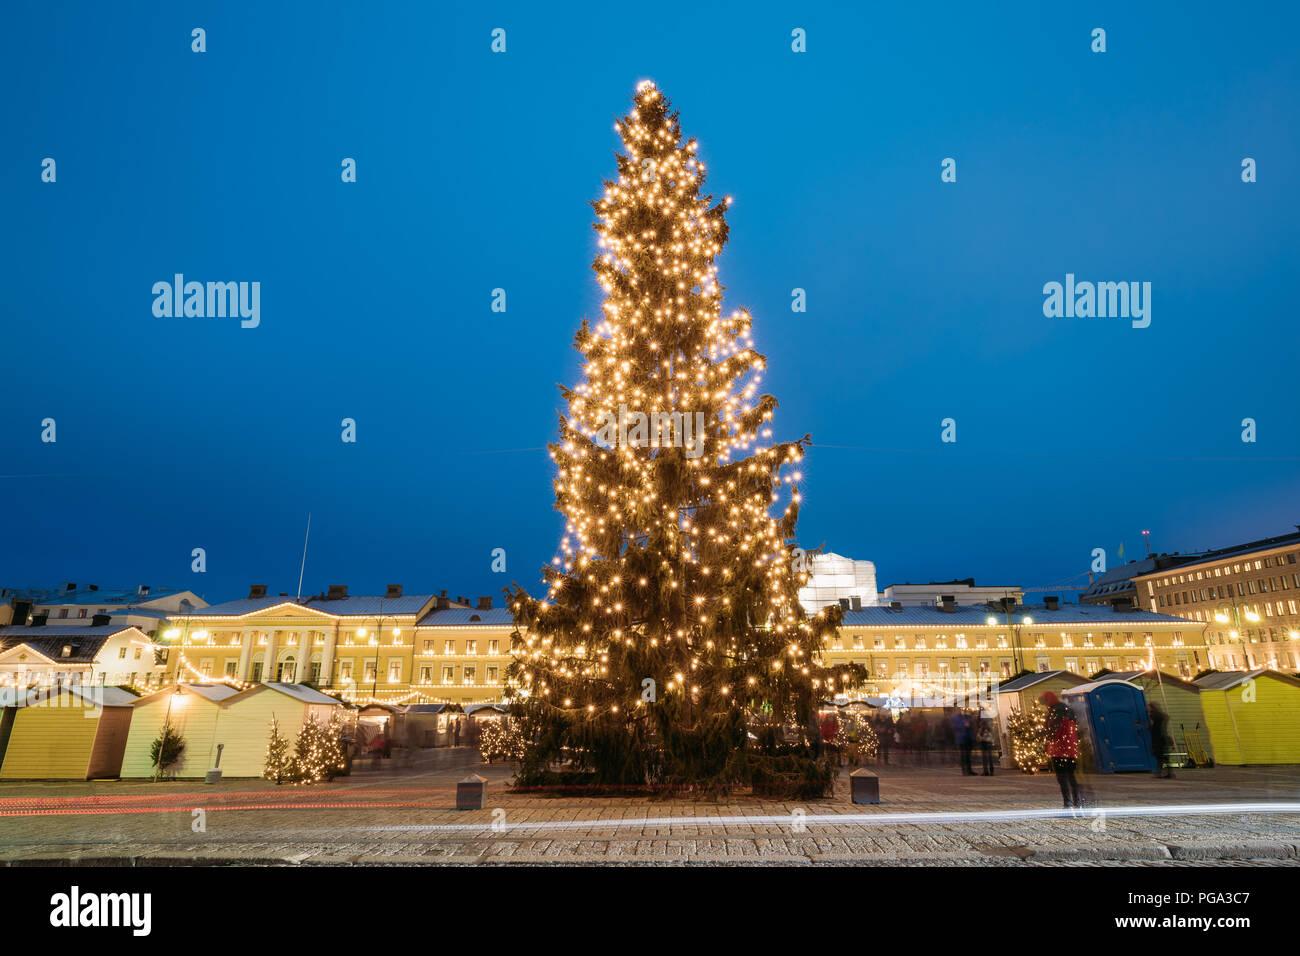 Helsinki, Finland. Evening View Of Christmas Tree On Senate Square In Evening Night Christmas Xmas Festive Illuminations. - Stock Image